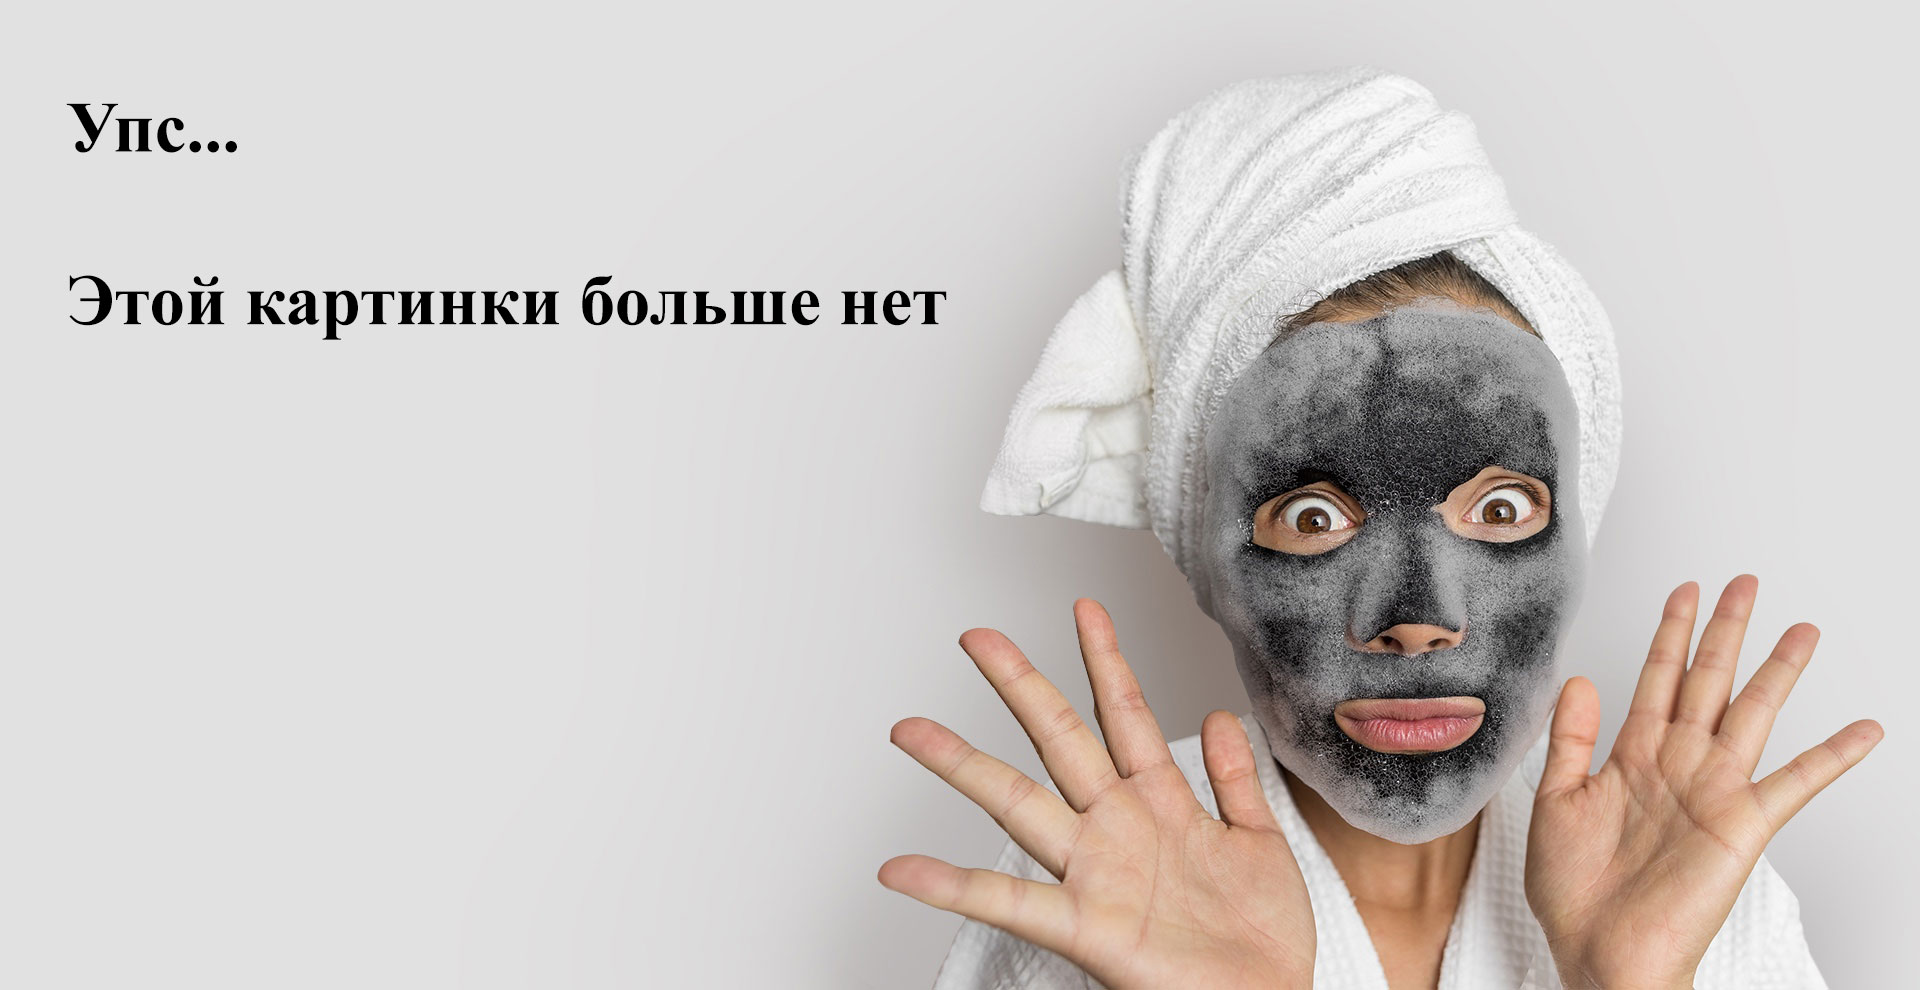 Staleks, Лопатка маникюрная Beauty/Care, PBC-10/2